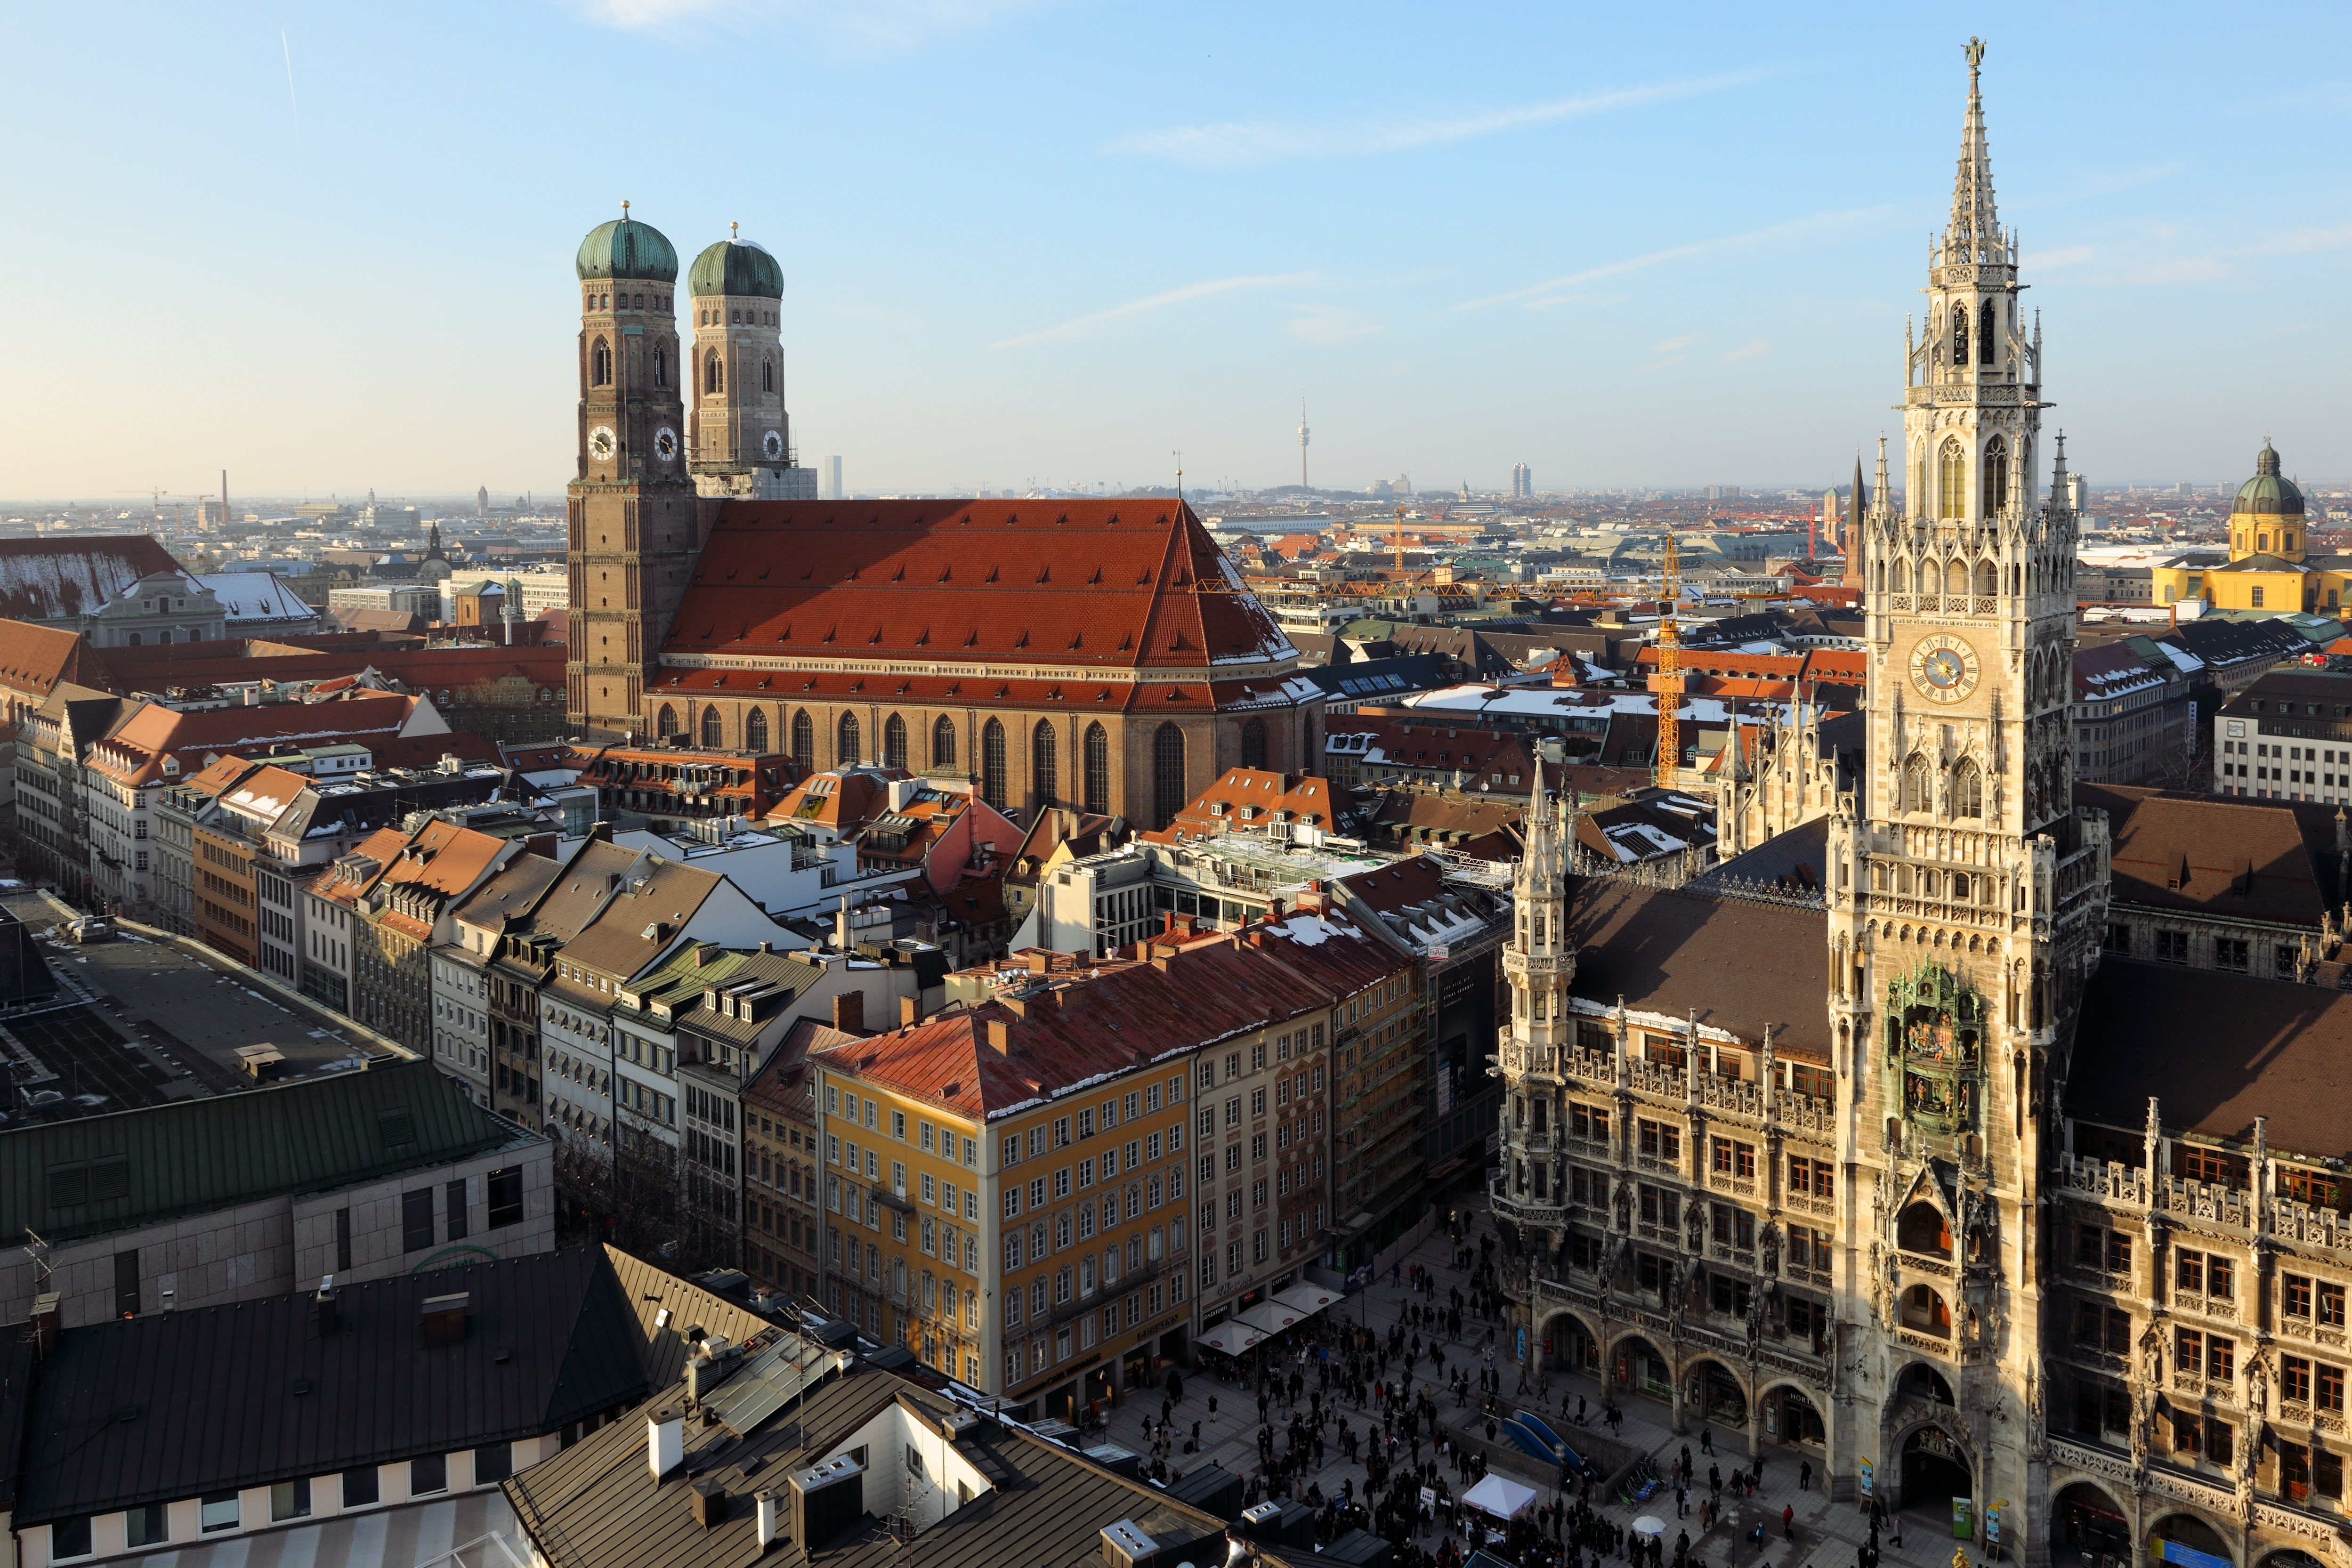 File Frauenkirche And Neues Rathaus Munich March 2013 JPG